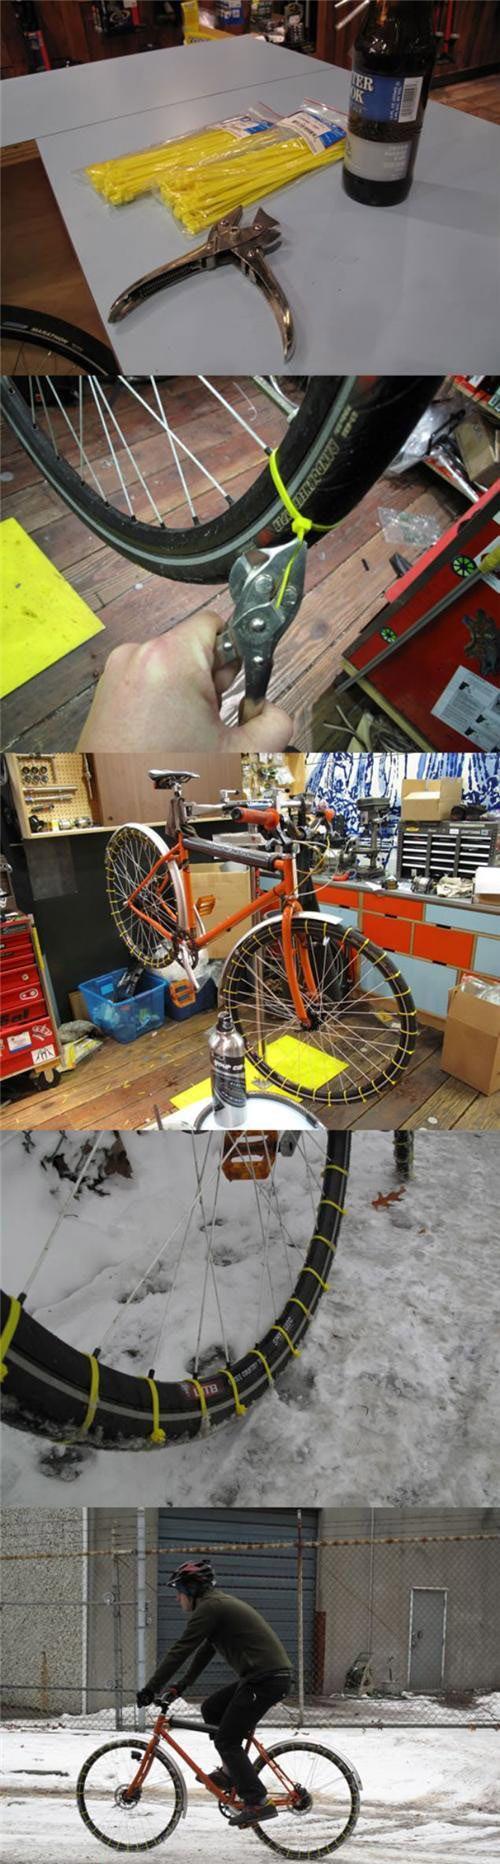 Bike snow tires!